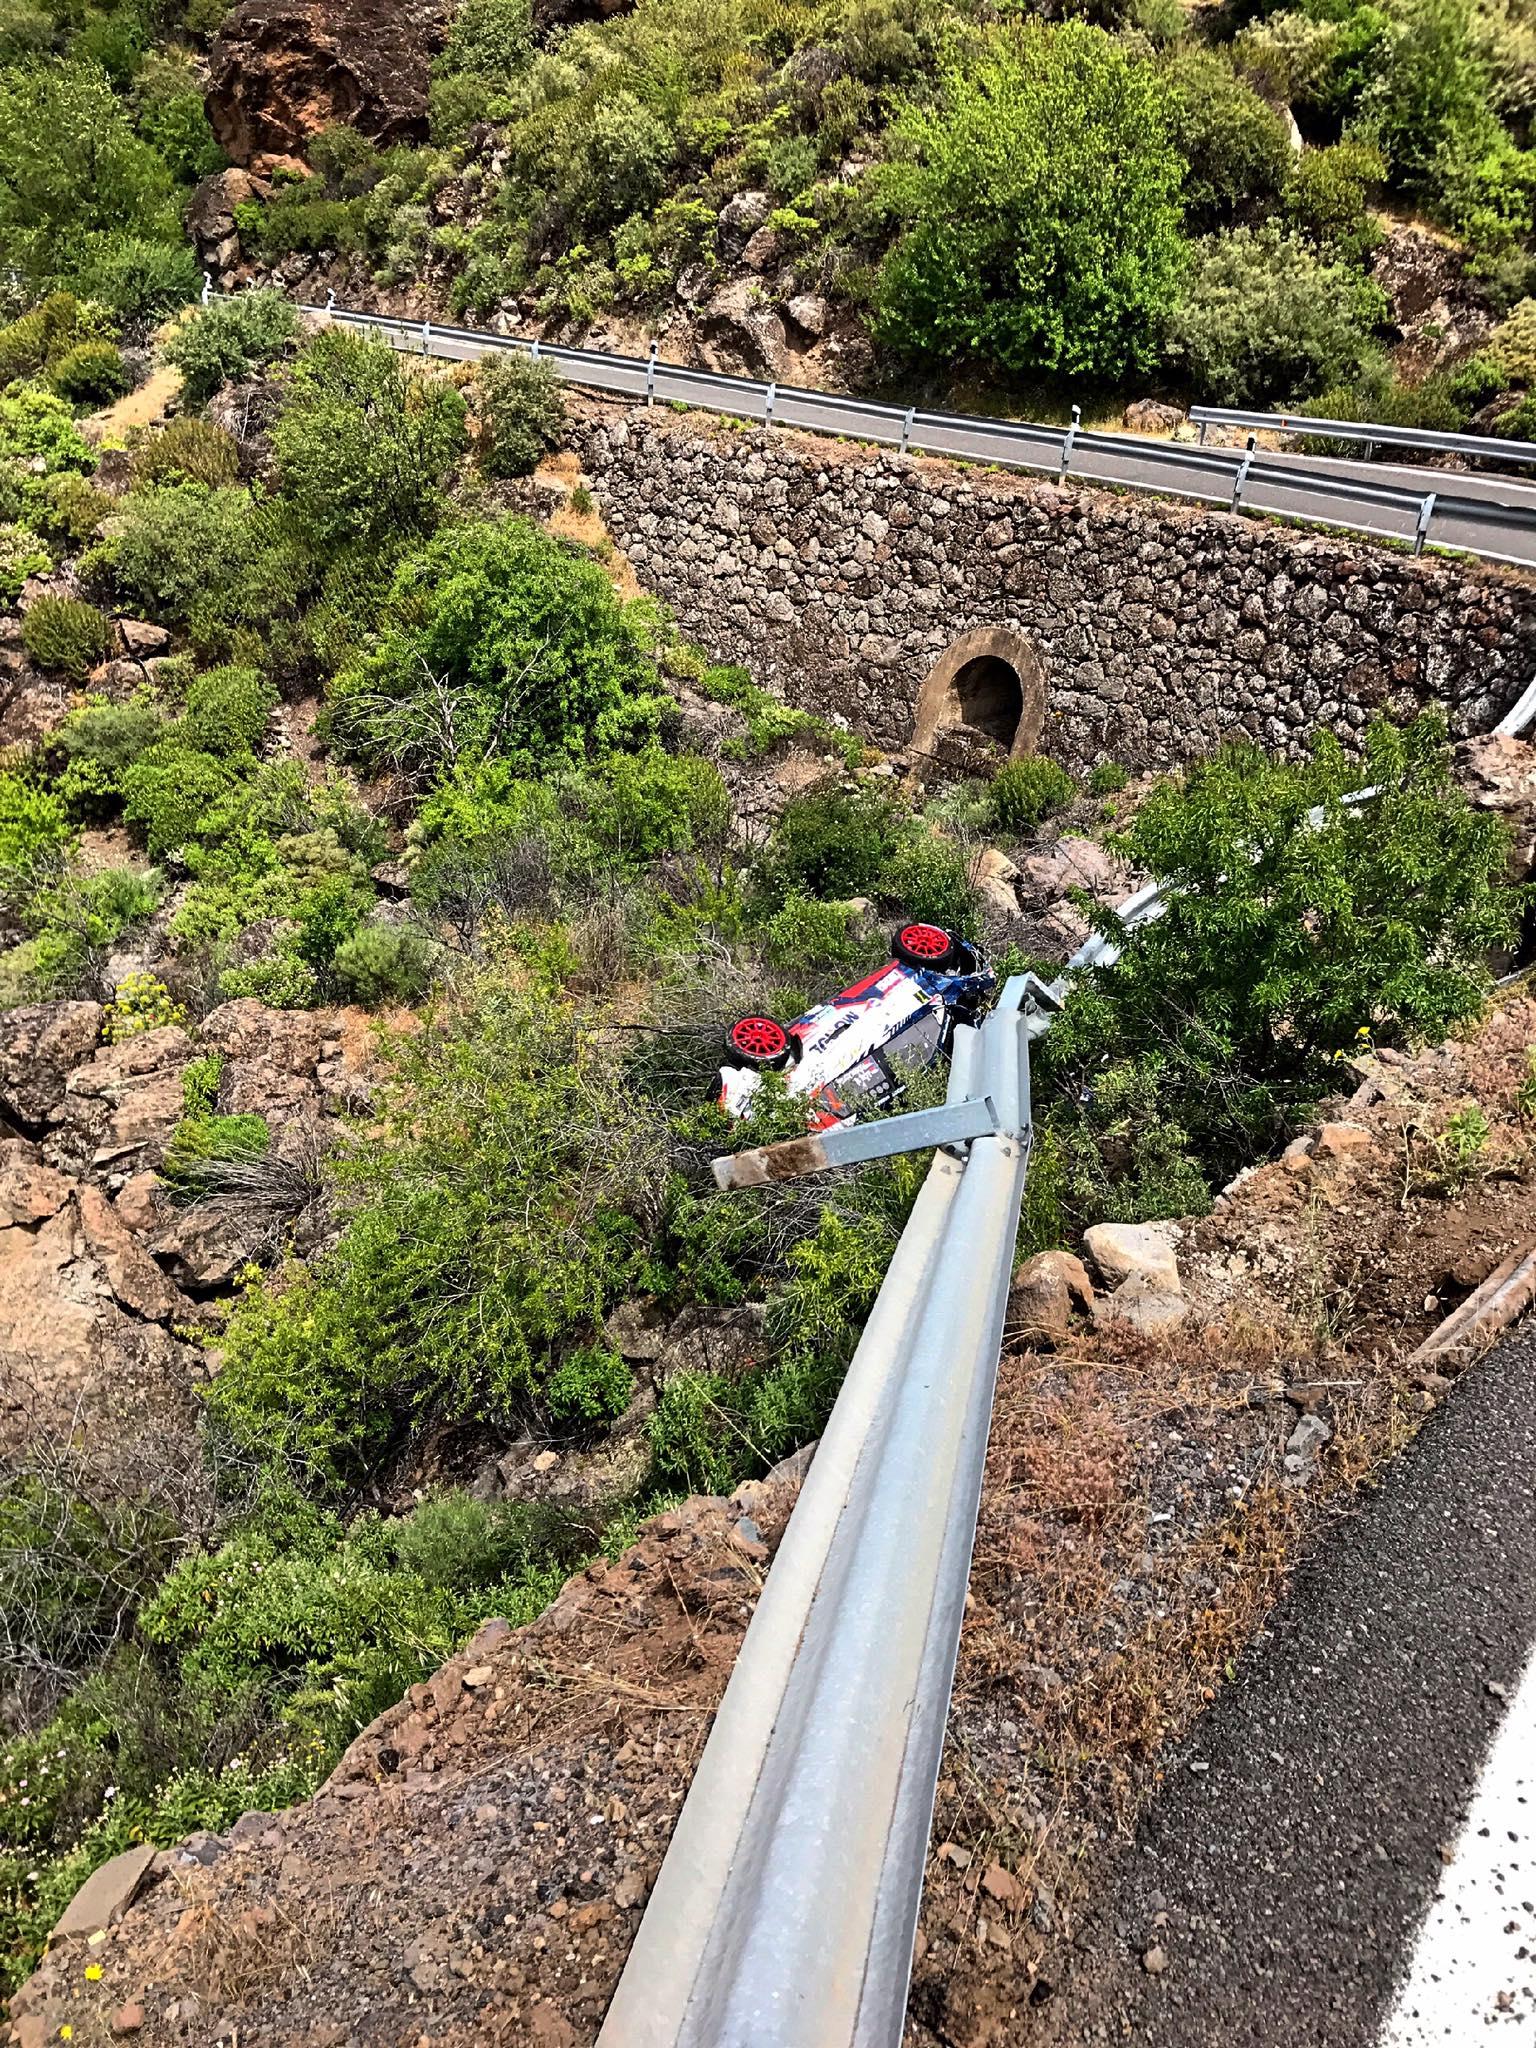 Rally Islas Canarias 2017 ERC - Página 2 36555_18238702_1345211145556732_4071061073288087065_o